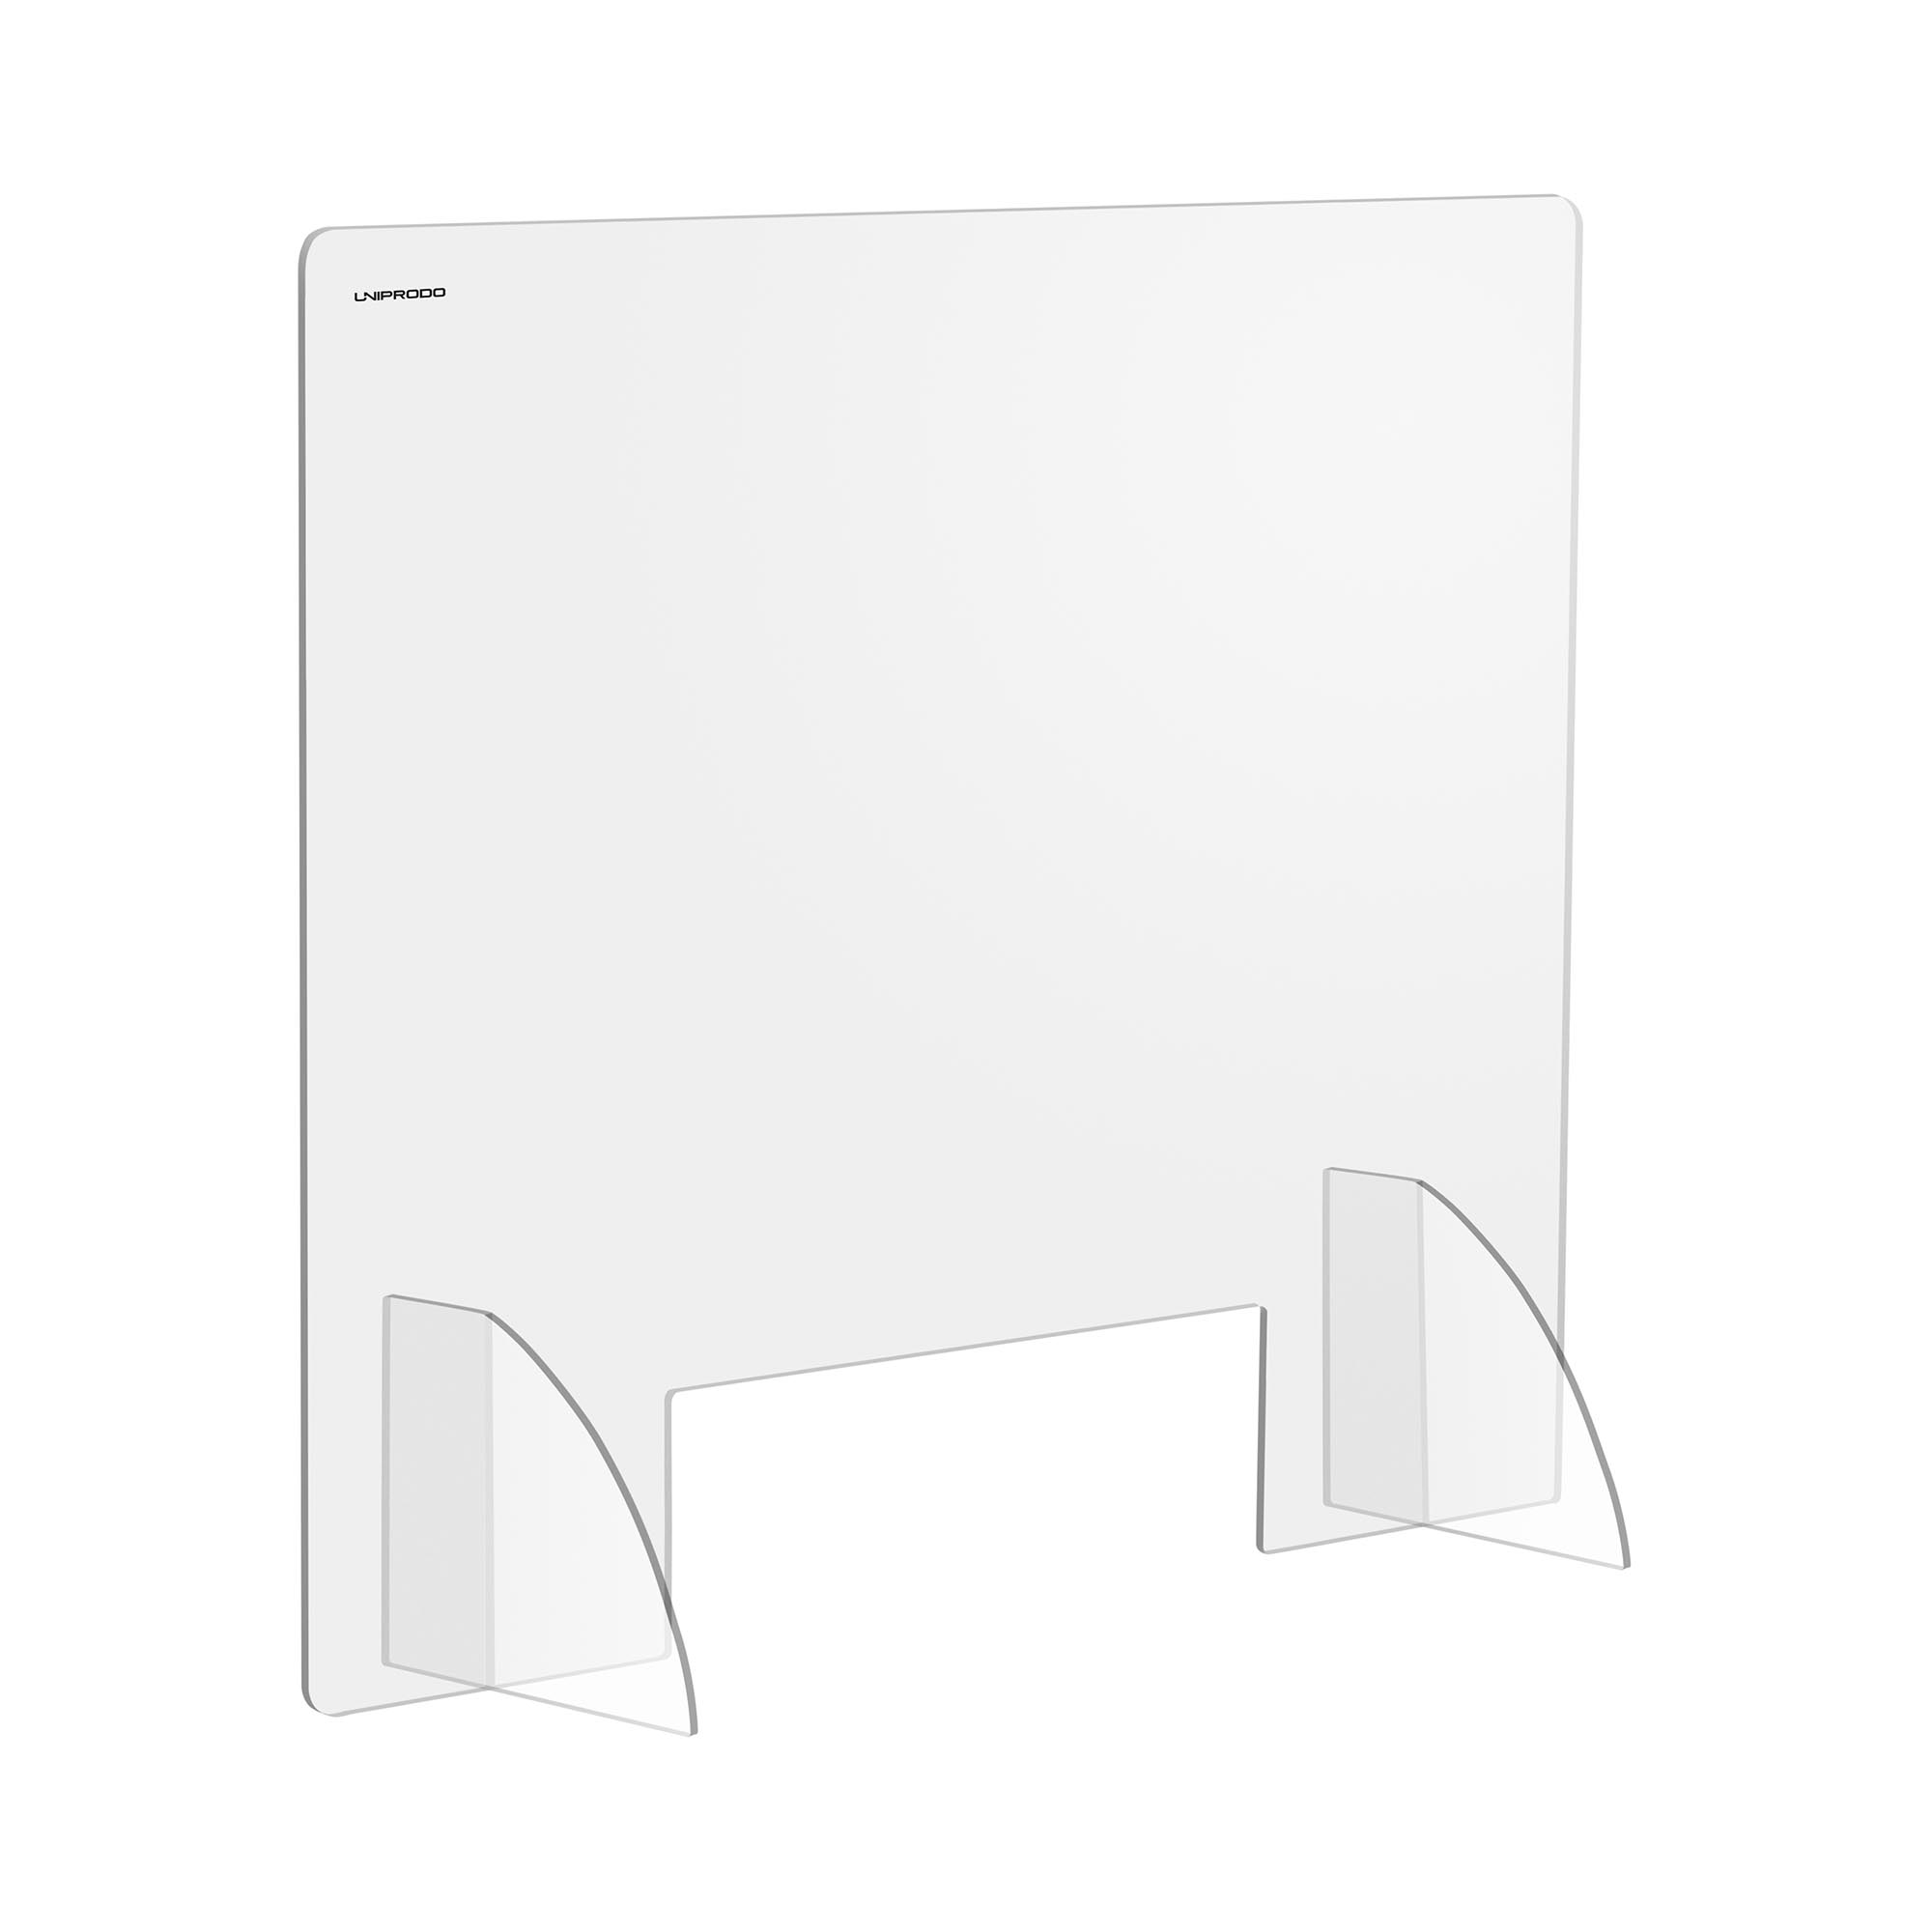 Uniprodo Spuckschutz - 95 x 80 cm - Acrylglas - Durchreiche 45 x 15 cm UNI-PPG02